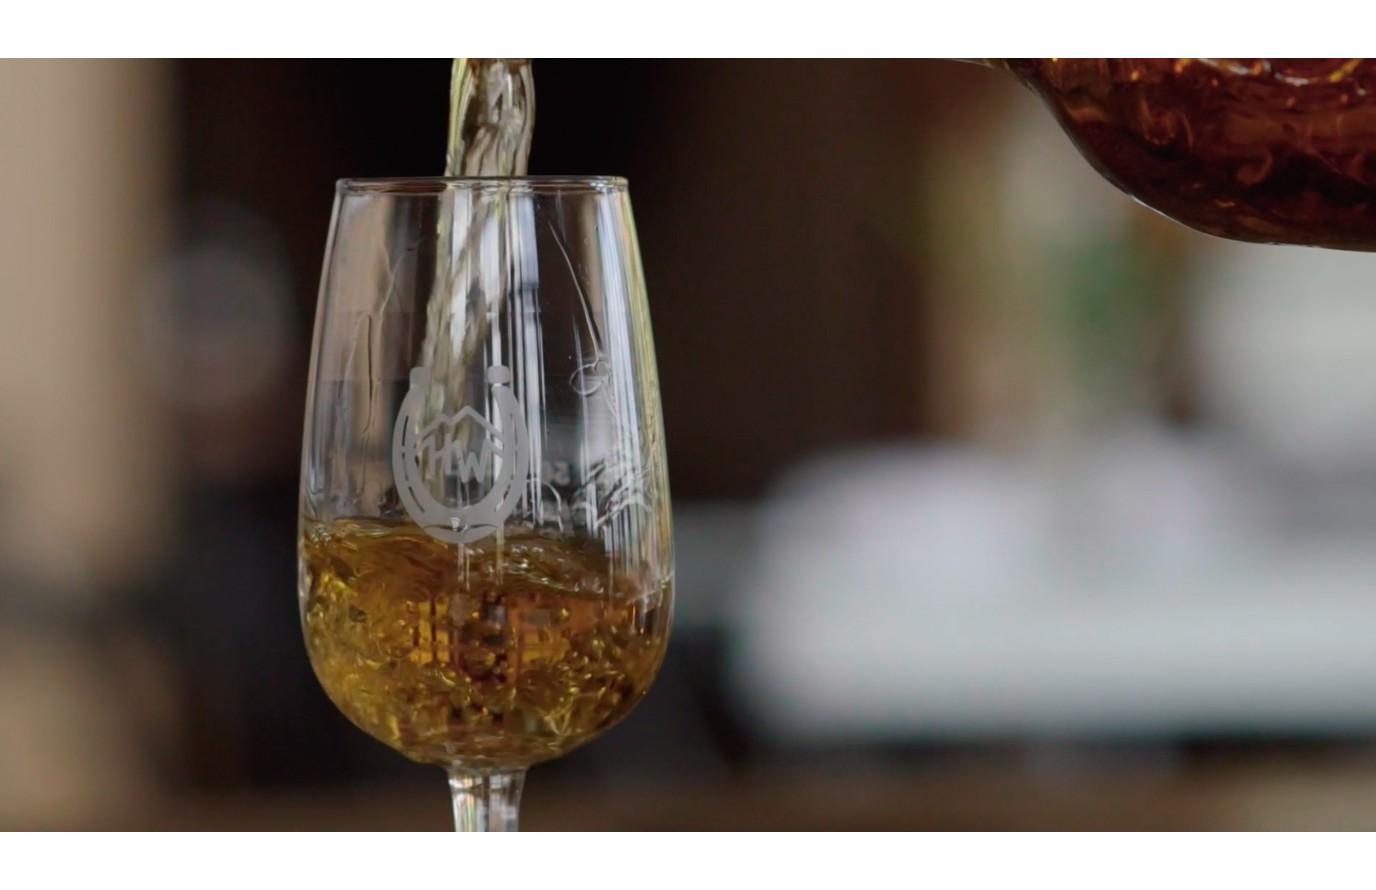 High West Distillery: The Art of Blending and Distilling